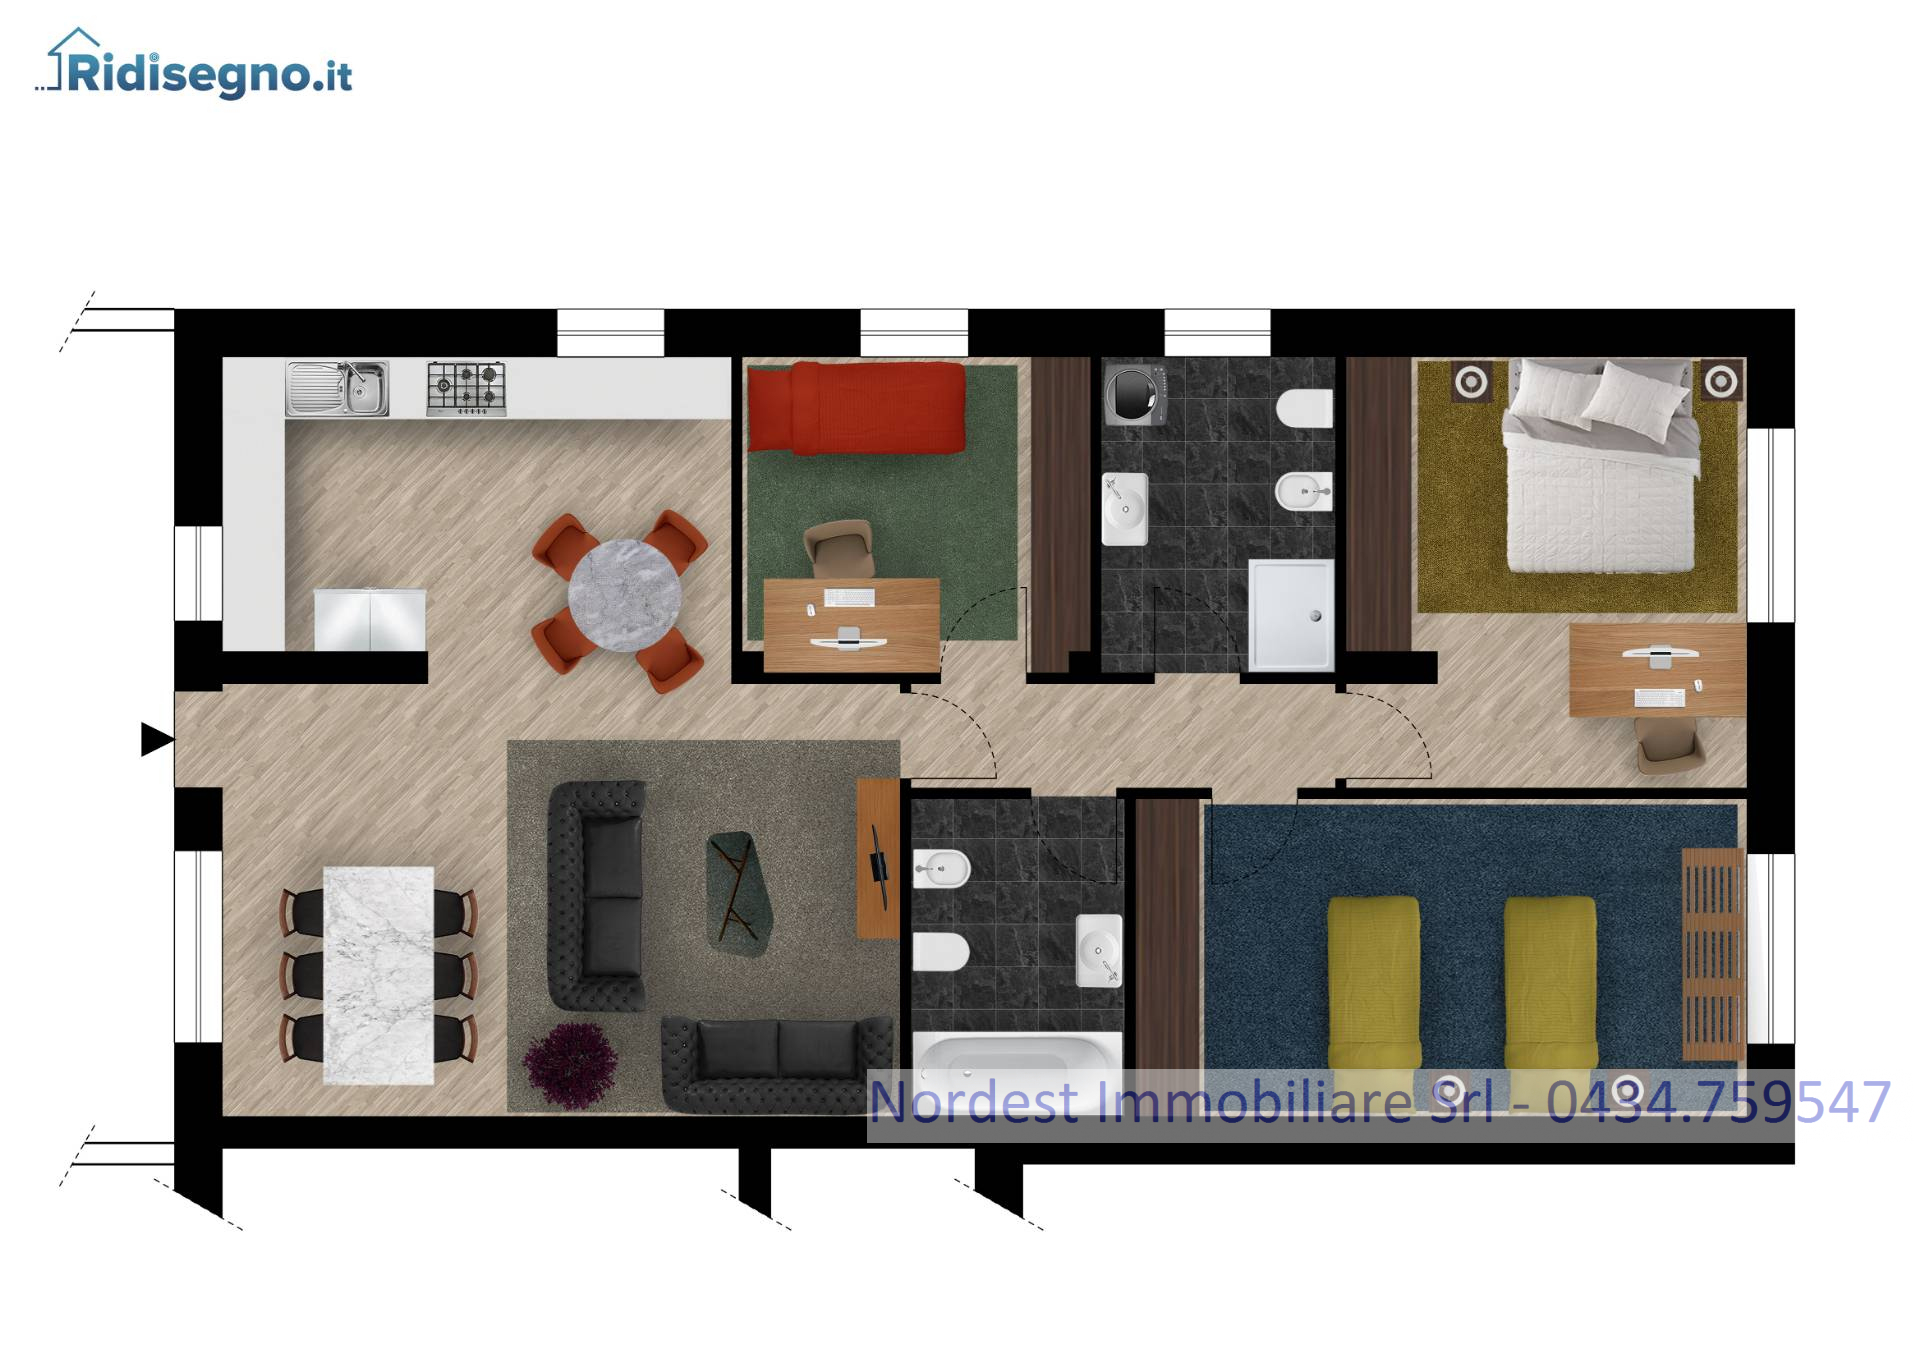 Appartamento in vendita a Gaiarine, 5 locali, Trattative riservate | CambioCasa.it